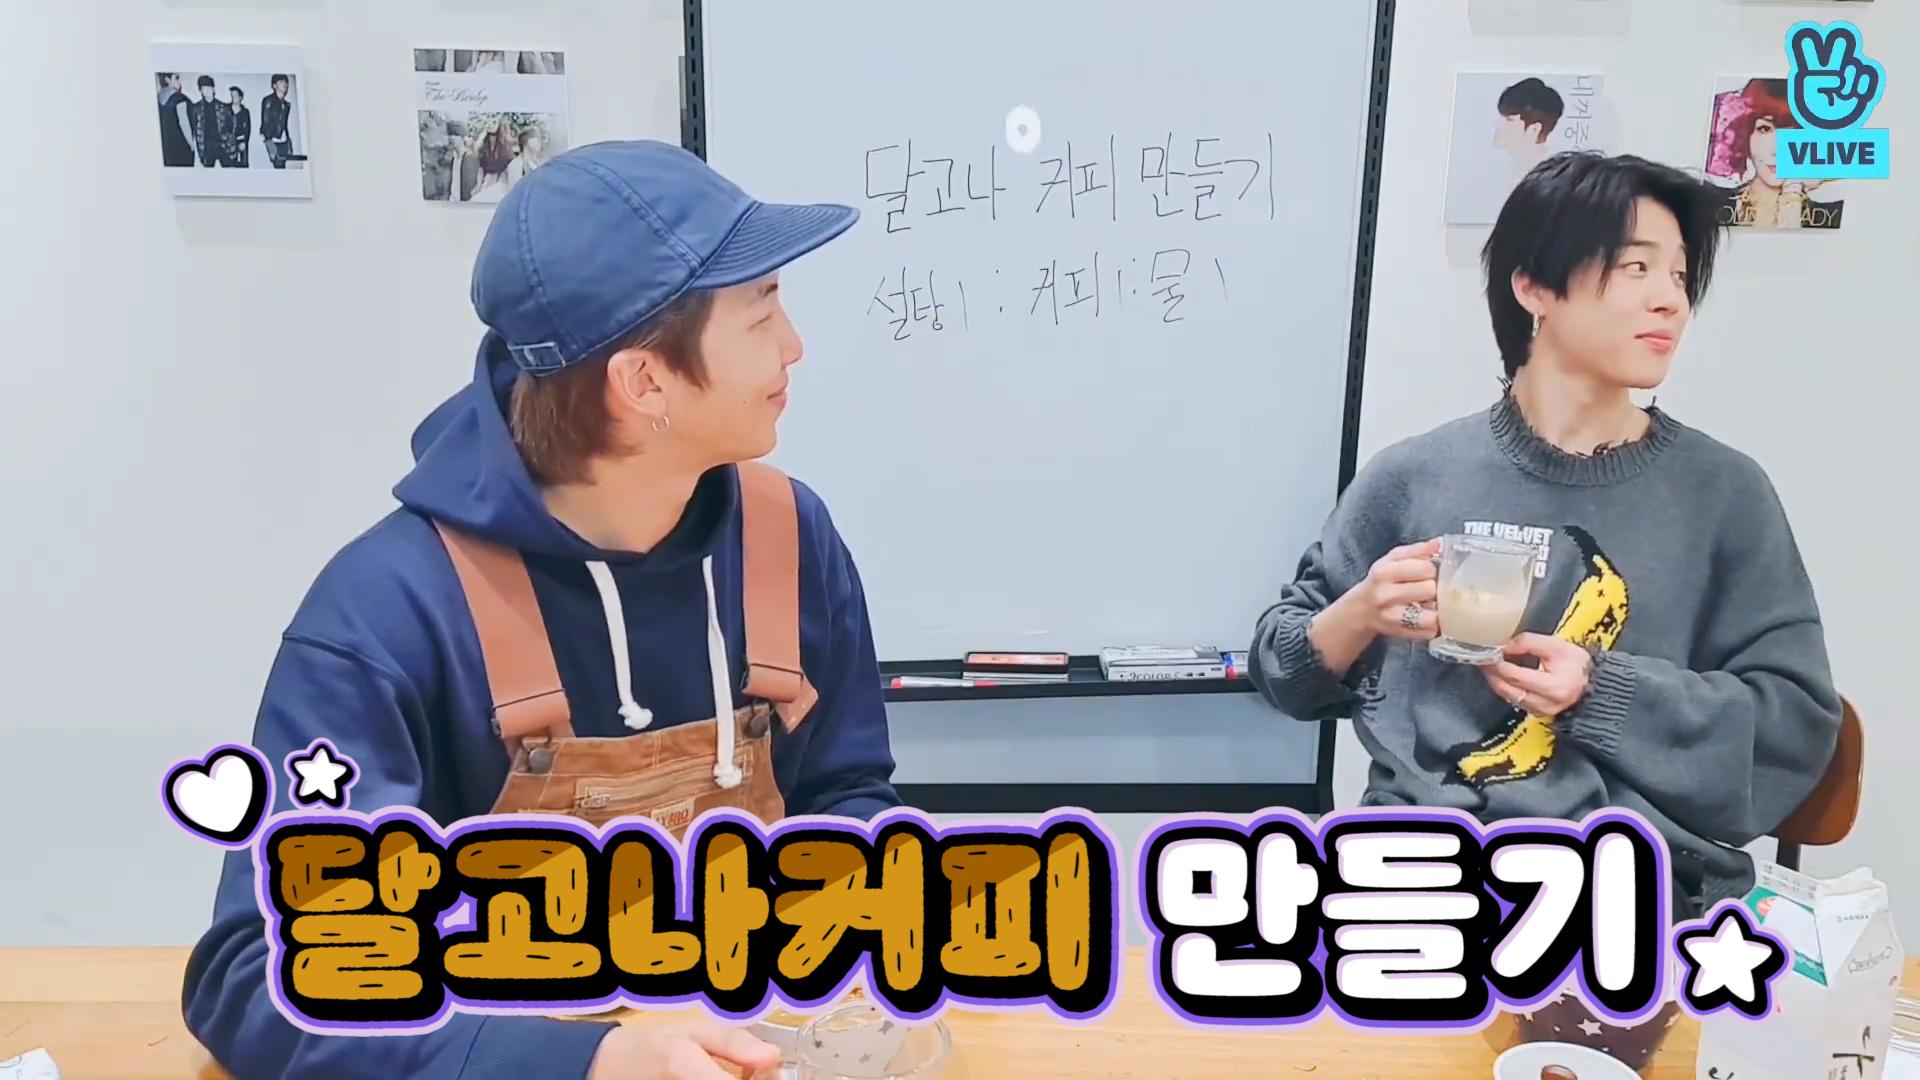 [BTS] 미니모니와 함께하는 달고나커피 한 잔의 여유☕️ (JIMIN&RM making dalgona coffee)